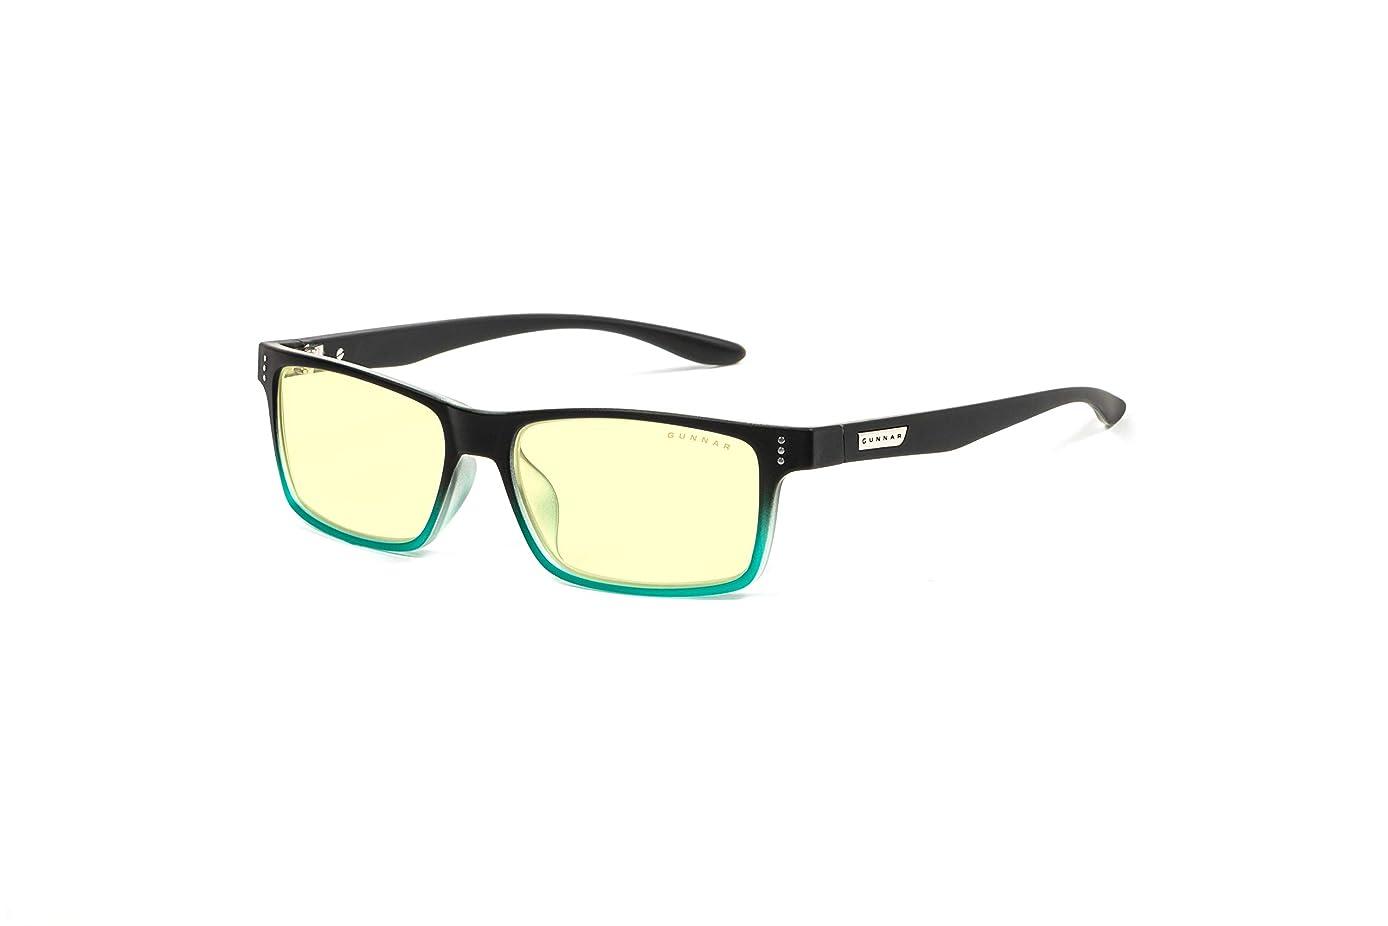 GUNNAR Youth Gaming and Computer Eyewear /Cruz, Onyx-Teal Frame, Amber Tint - Patented Lens, Reduce Digital Eye Strain, Block 65% of Harmful Blue Light